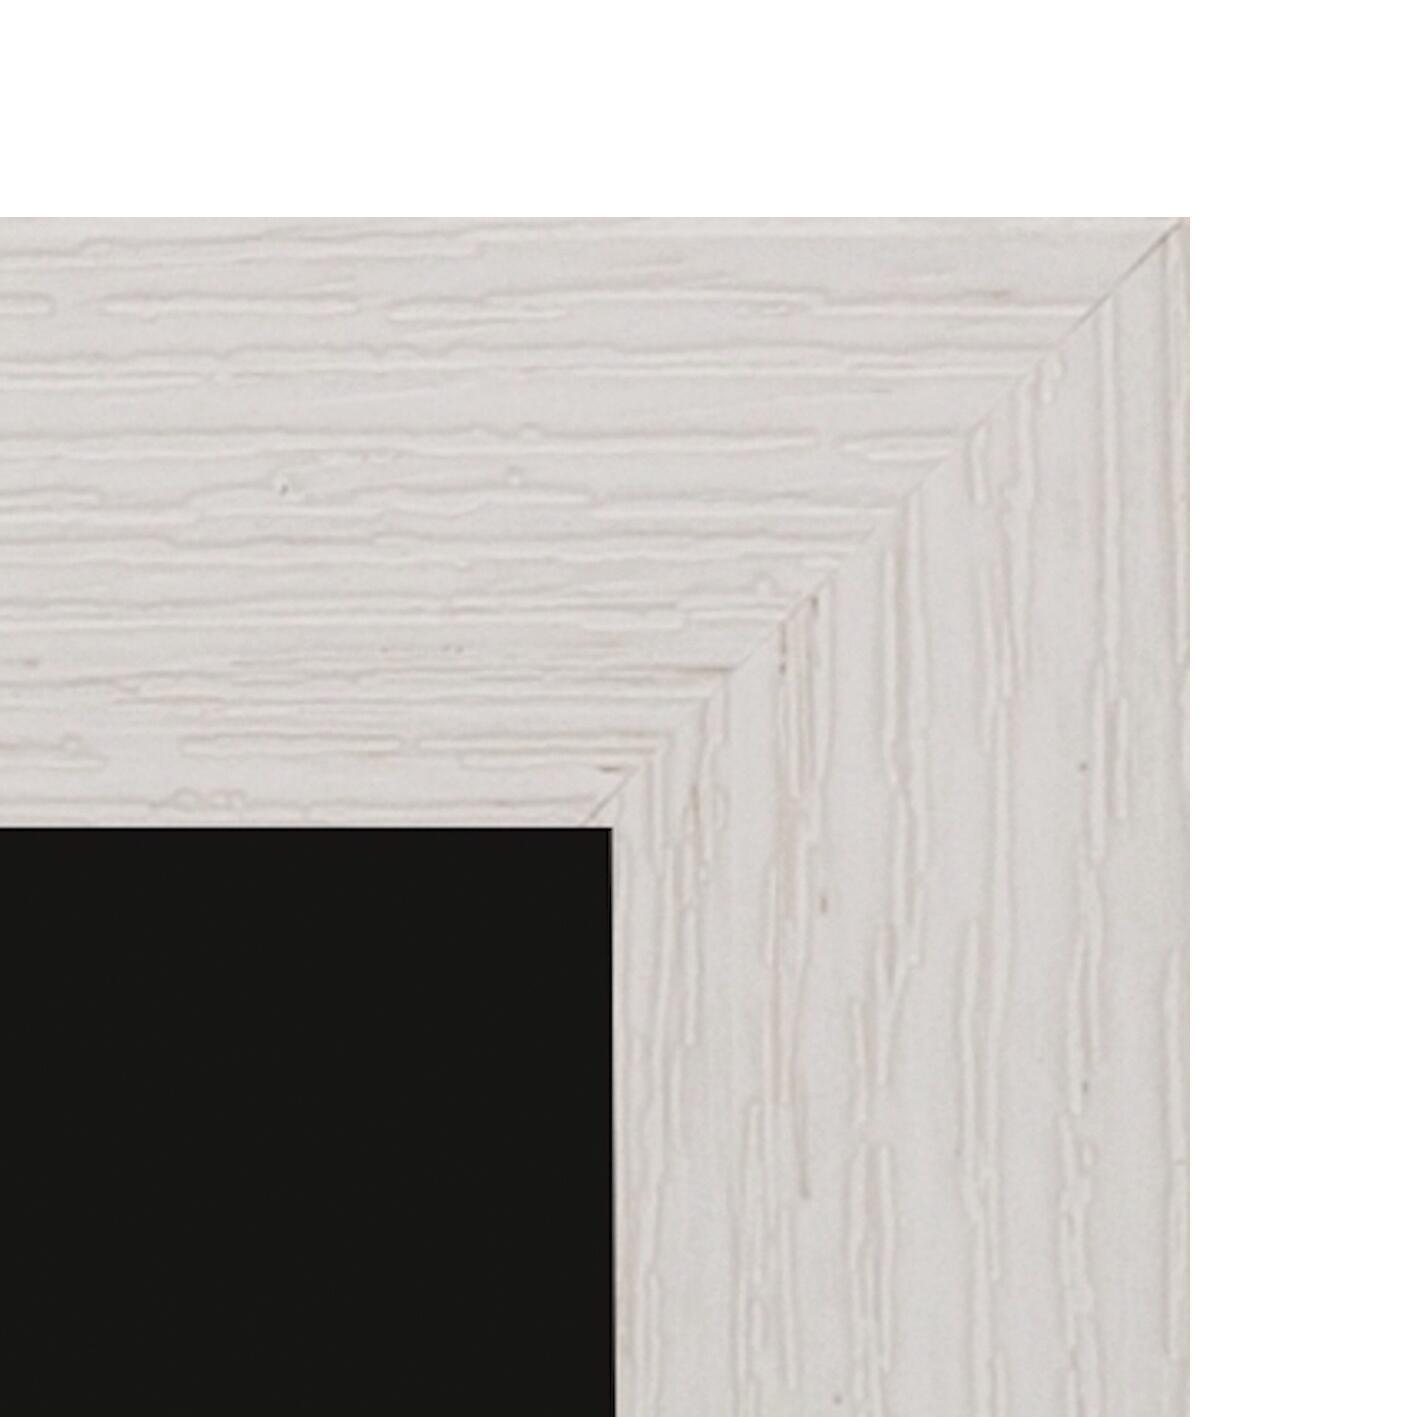 Lavagna per gesso Rigata bianco 36x46 cm - 2